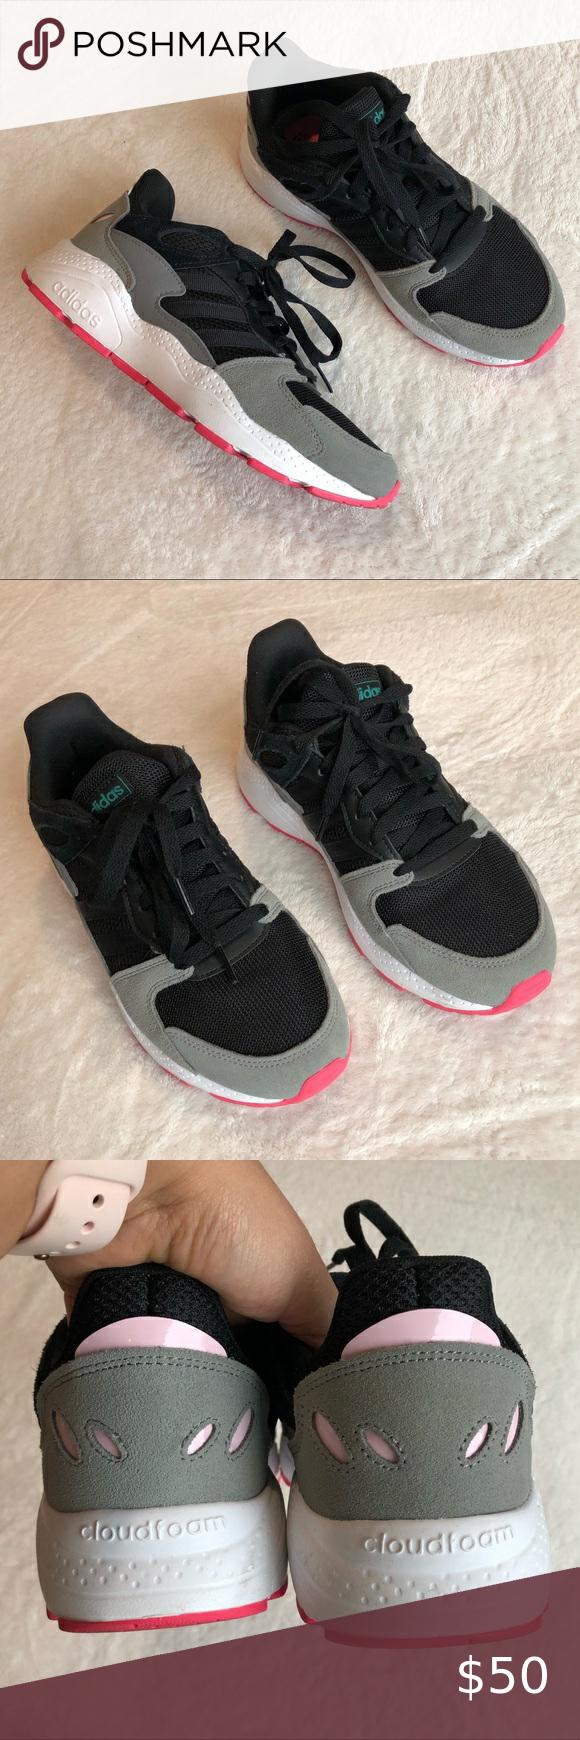 {Adidas} Cloudfoam Sneakers